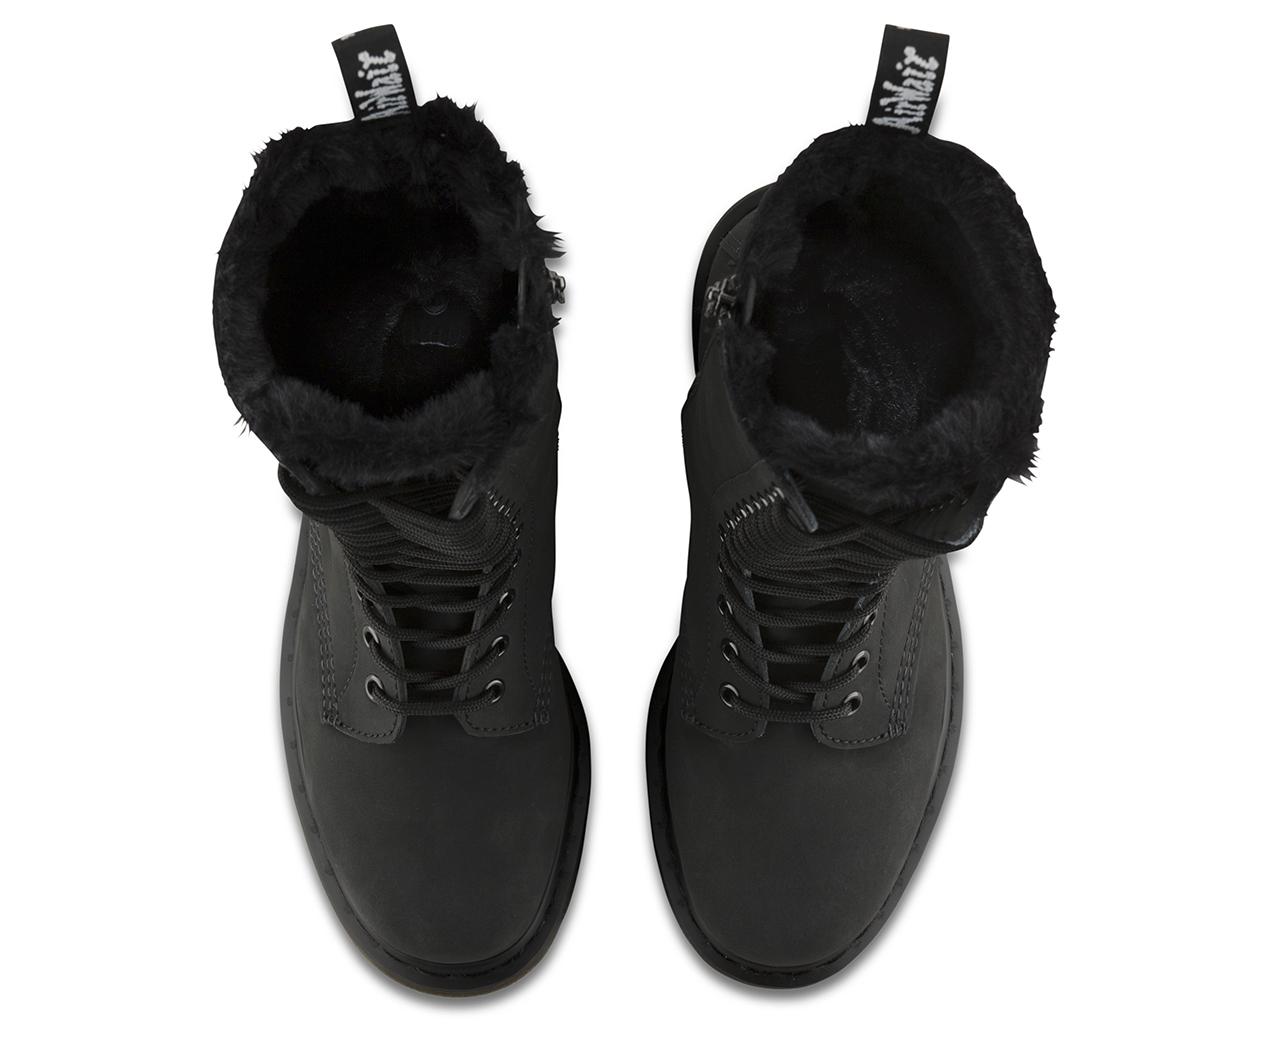 fur lined 1b99 women 39 s boots official dr martens store. Black Bedroom Furniture Sets. Home Design Ideas